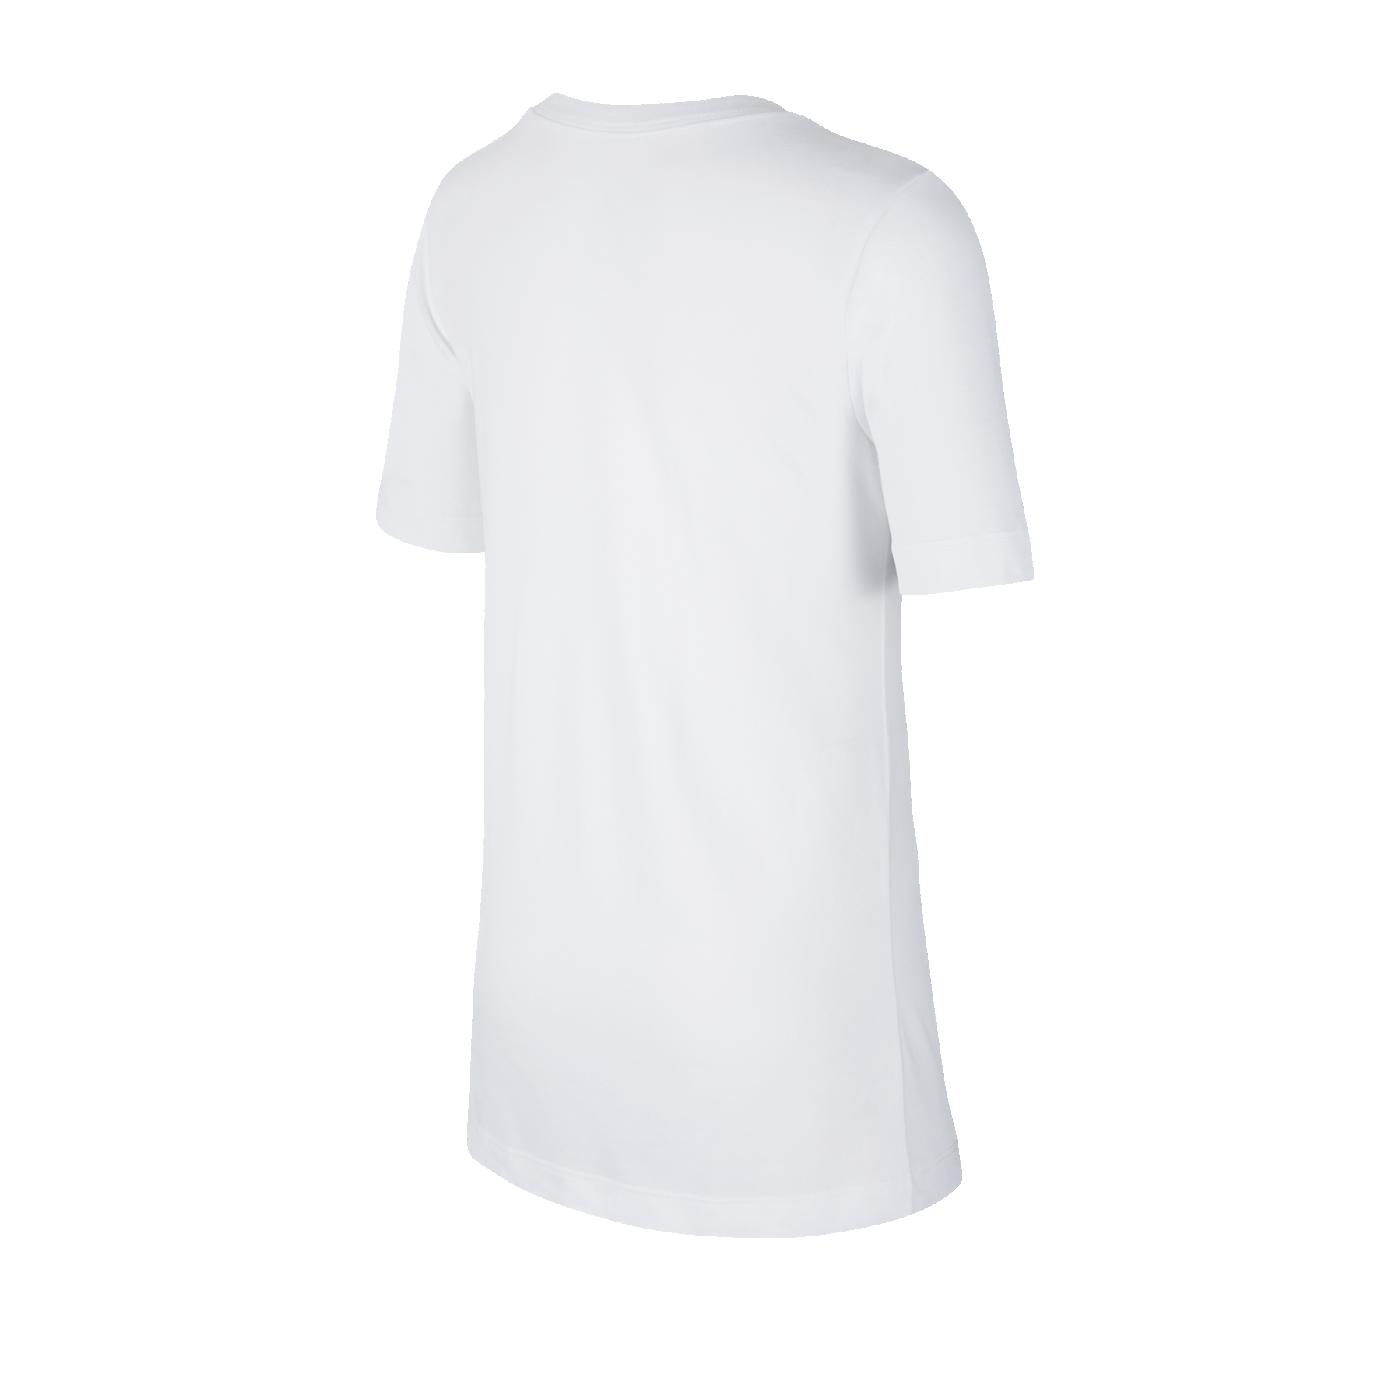 Nike Dry Mercurial Tee T-Shirt Kids Weiss F100 | Kurzarm ...